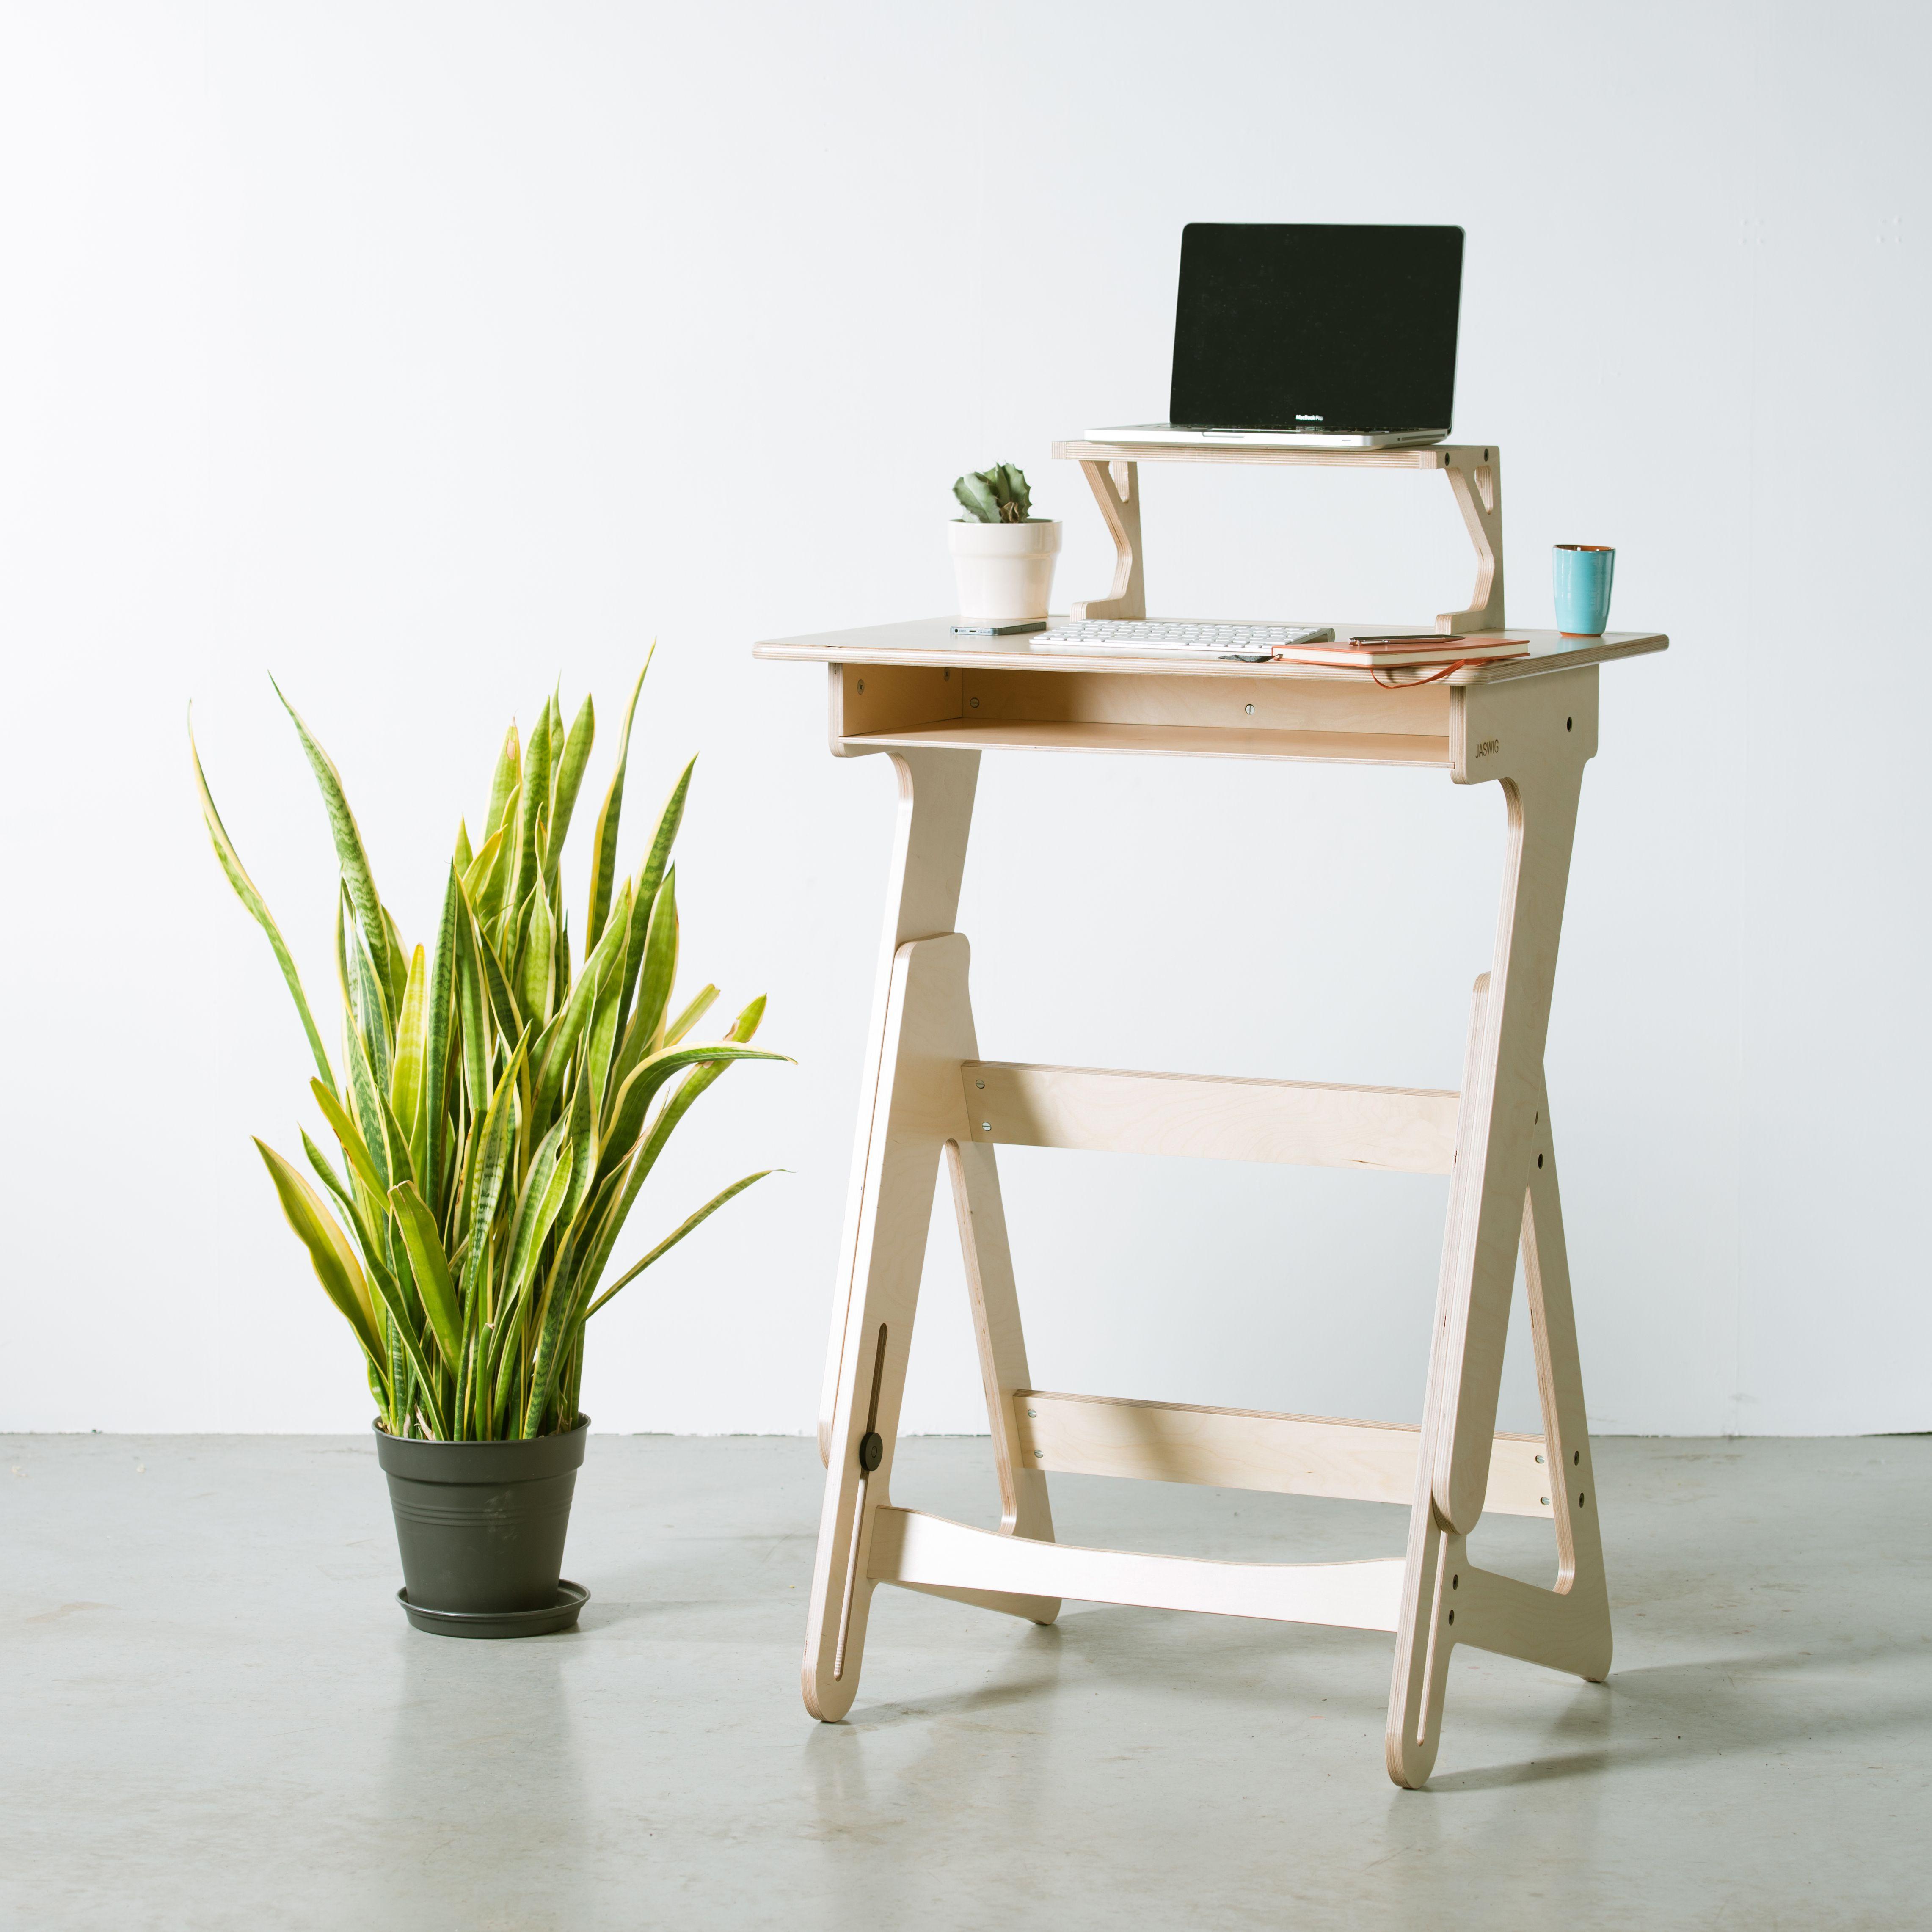 Scandinavian Designs Stand Up Desk : Scandinavian designs desks network plus sit stand desk